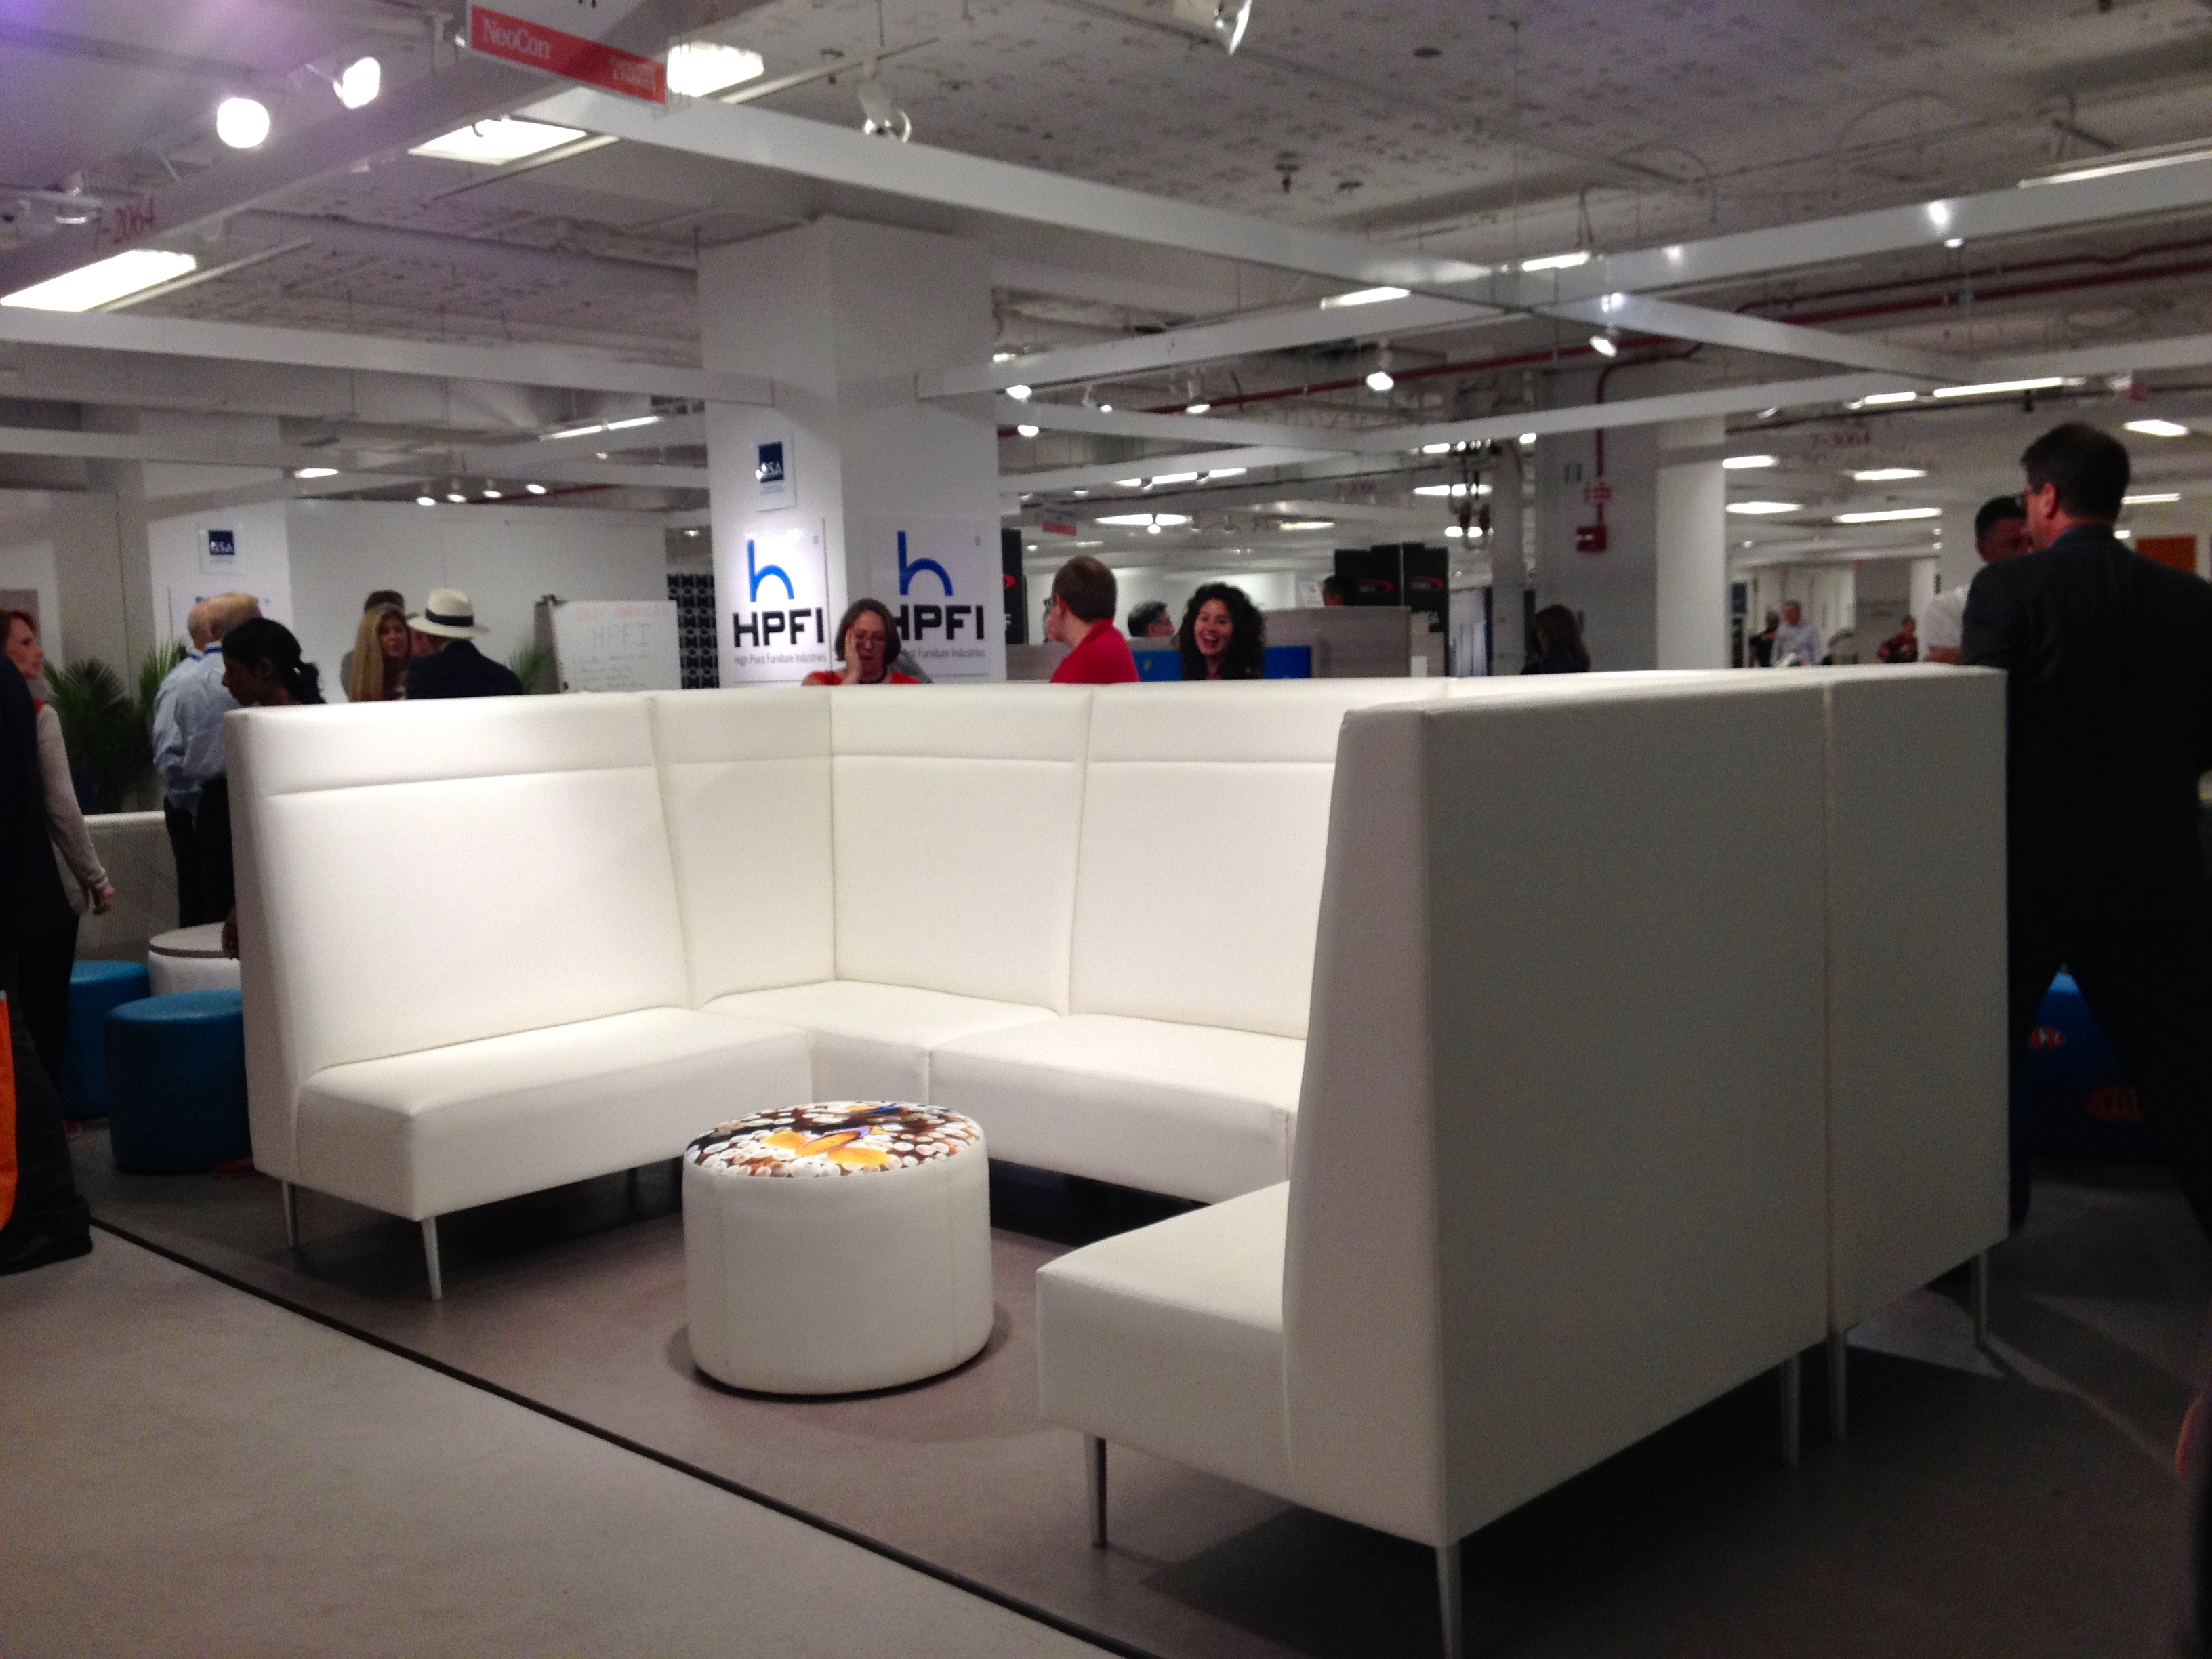 The Most Innovative Furniture Designs And Advances In Interior Design